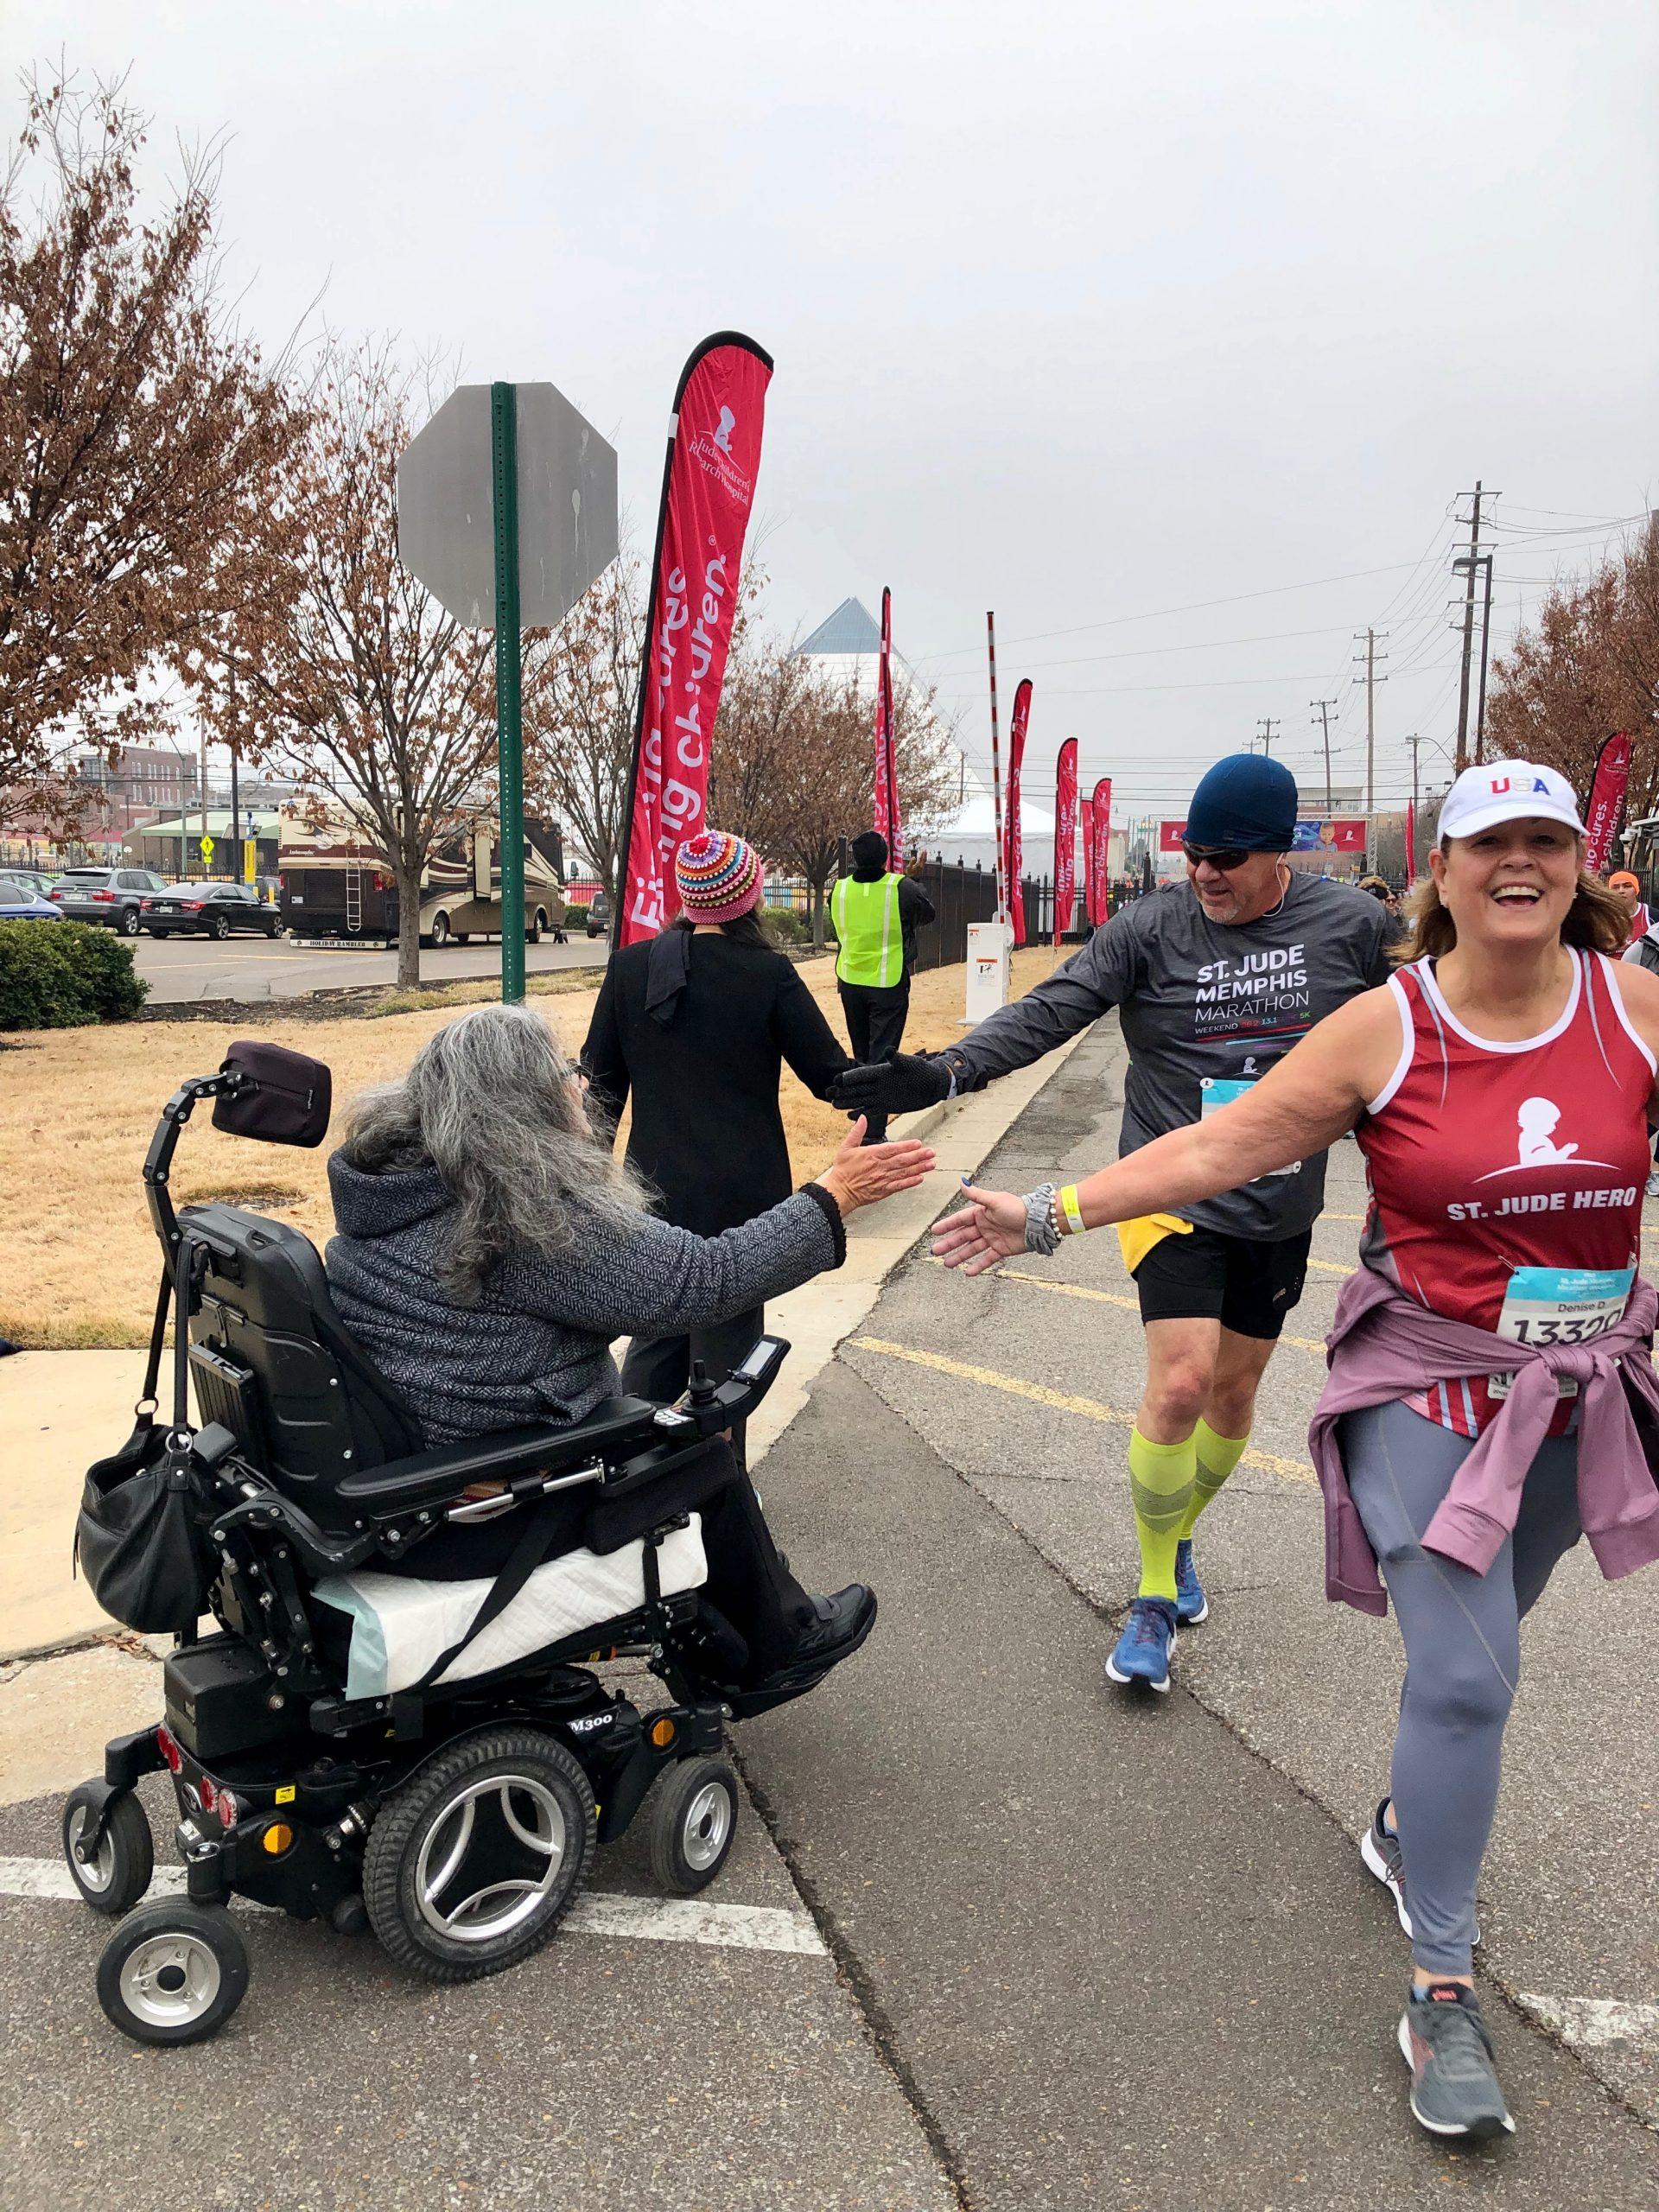 Meet Gabby Salinas: high-fiving at the St. Jude Marathon